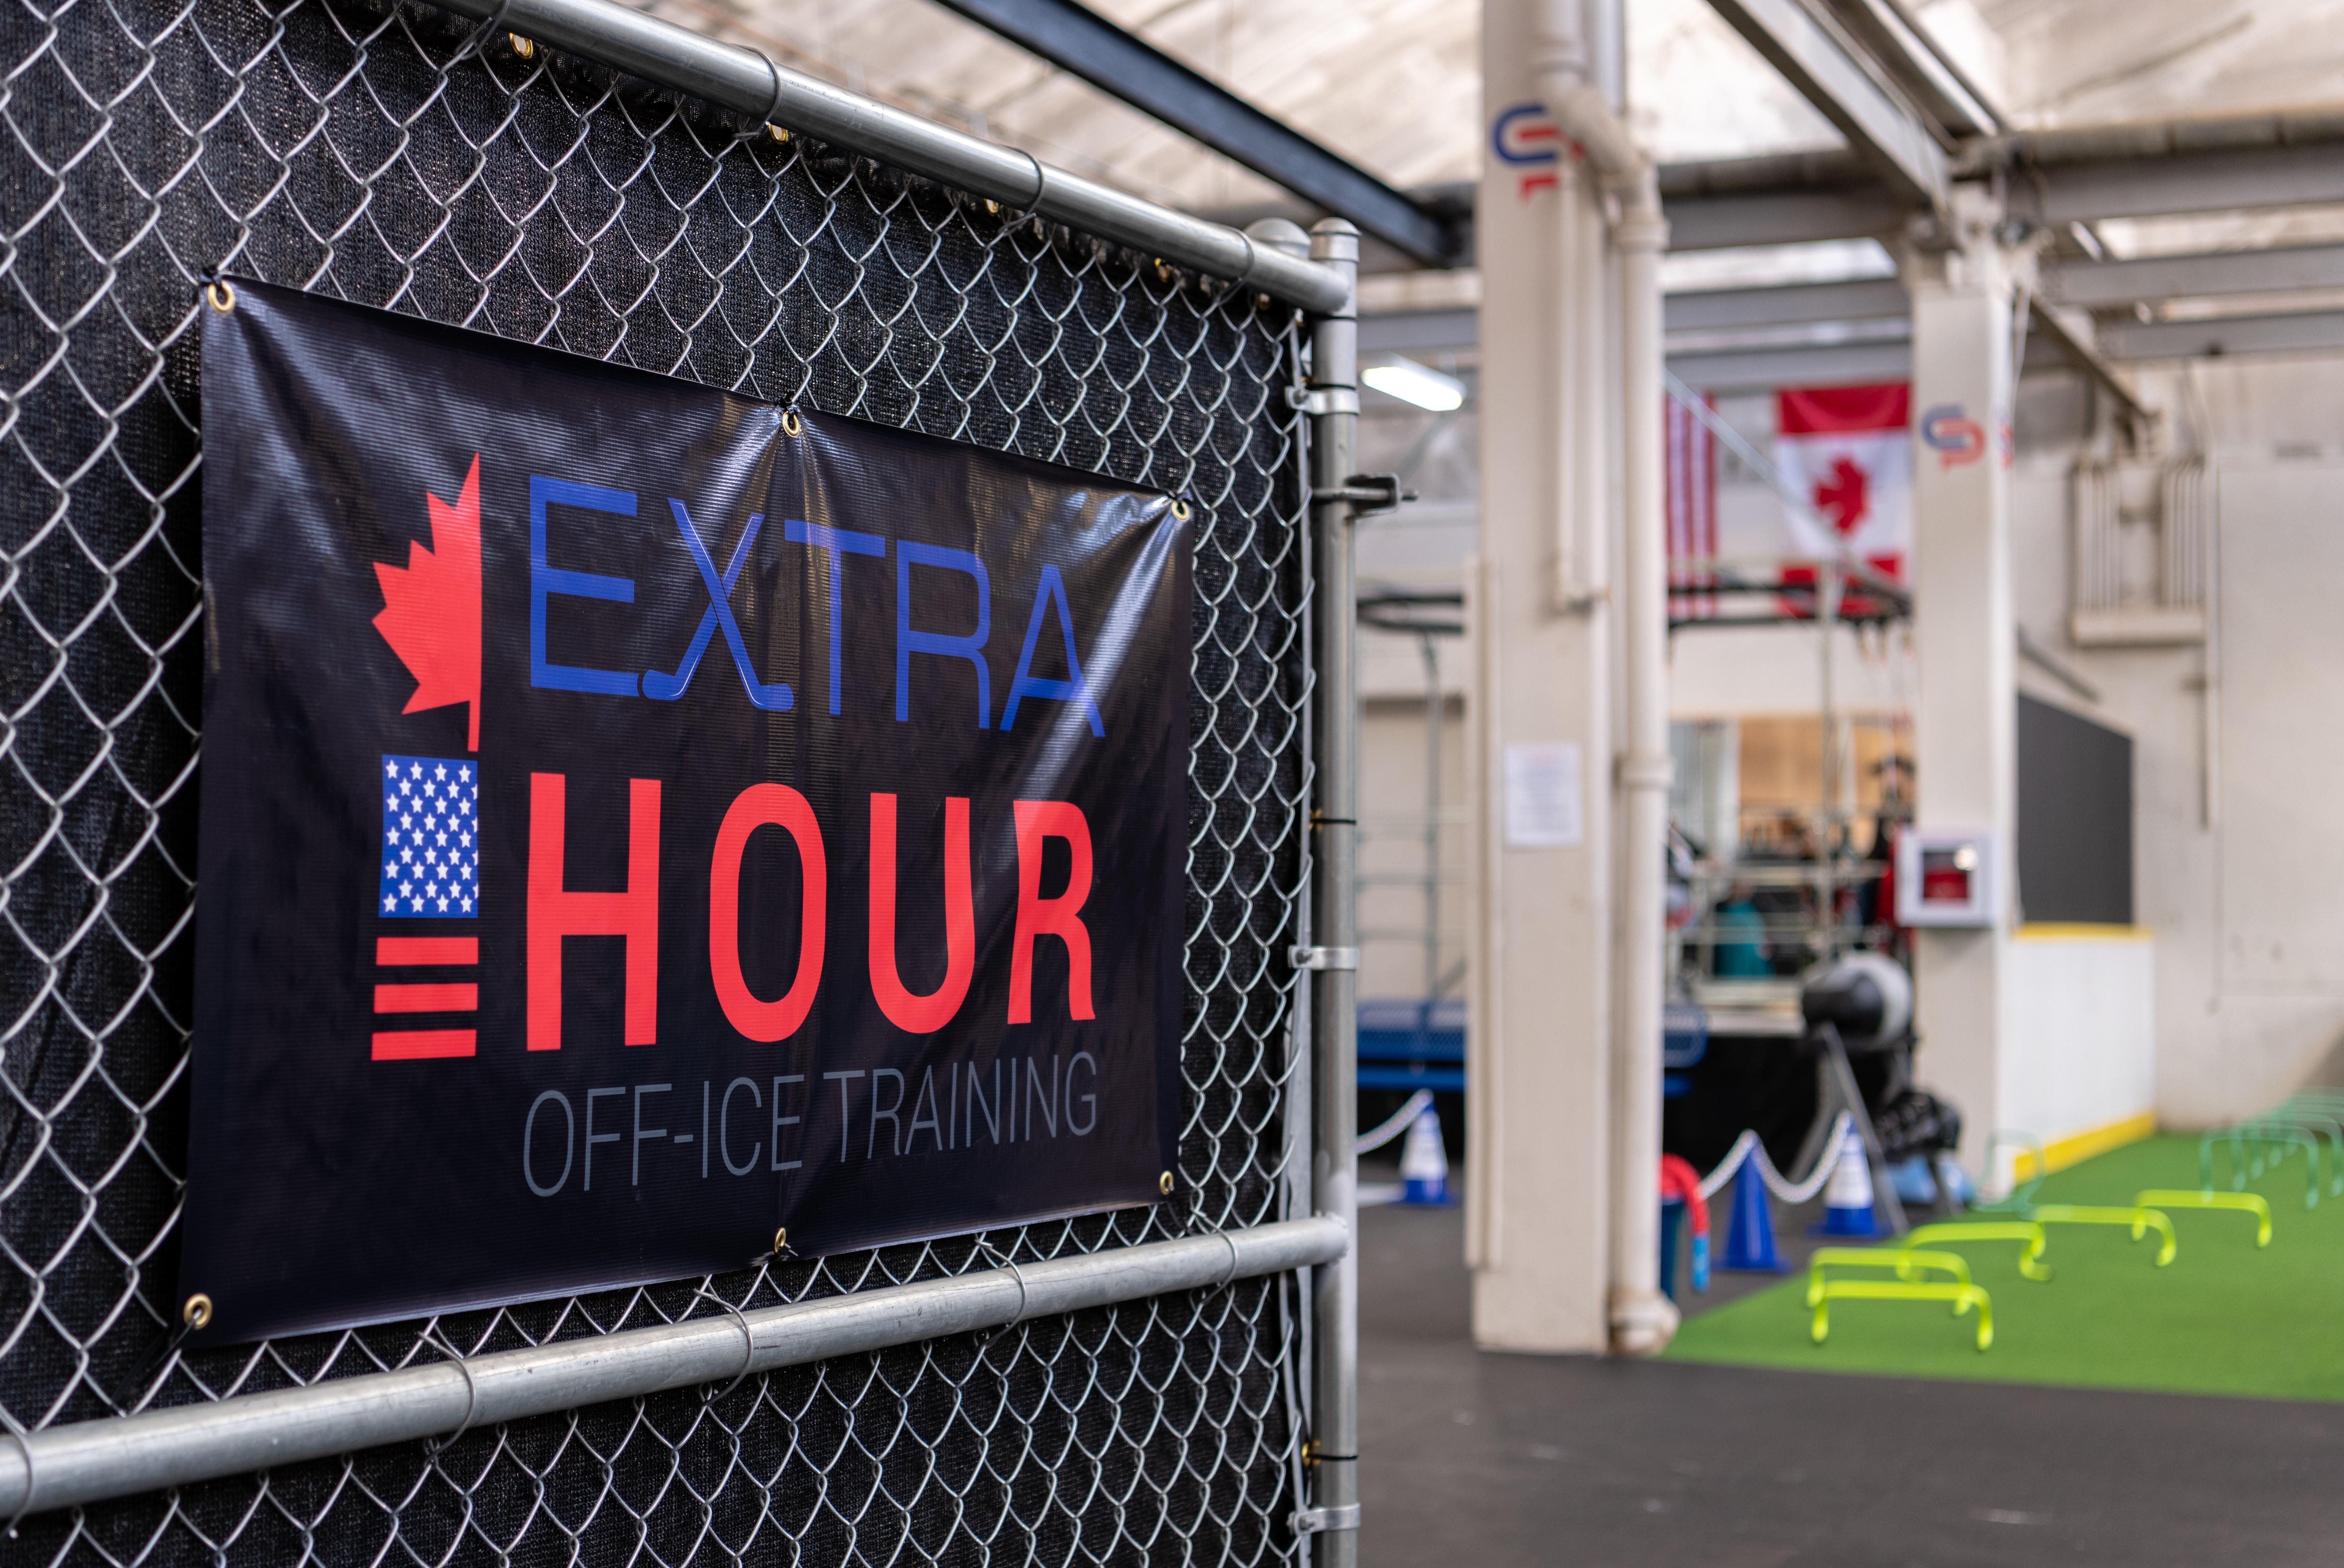 Extra Hour Off-Ice Hockey Training facility entrance